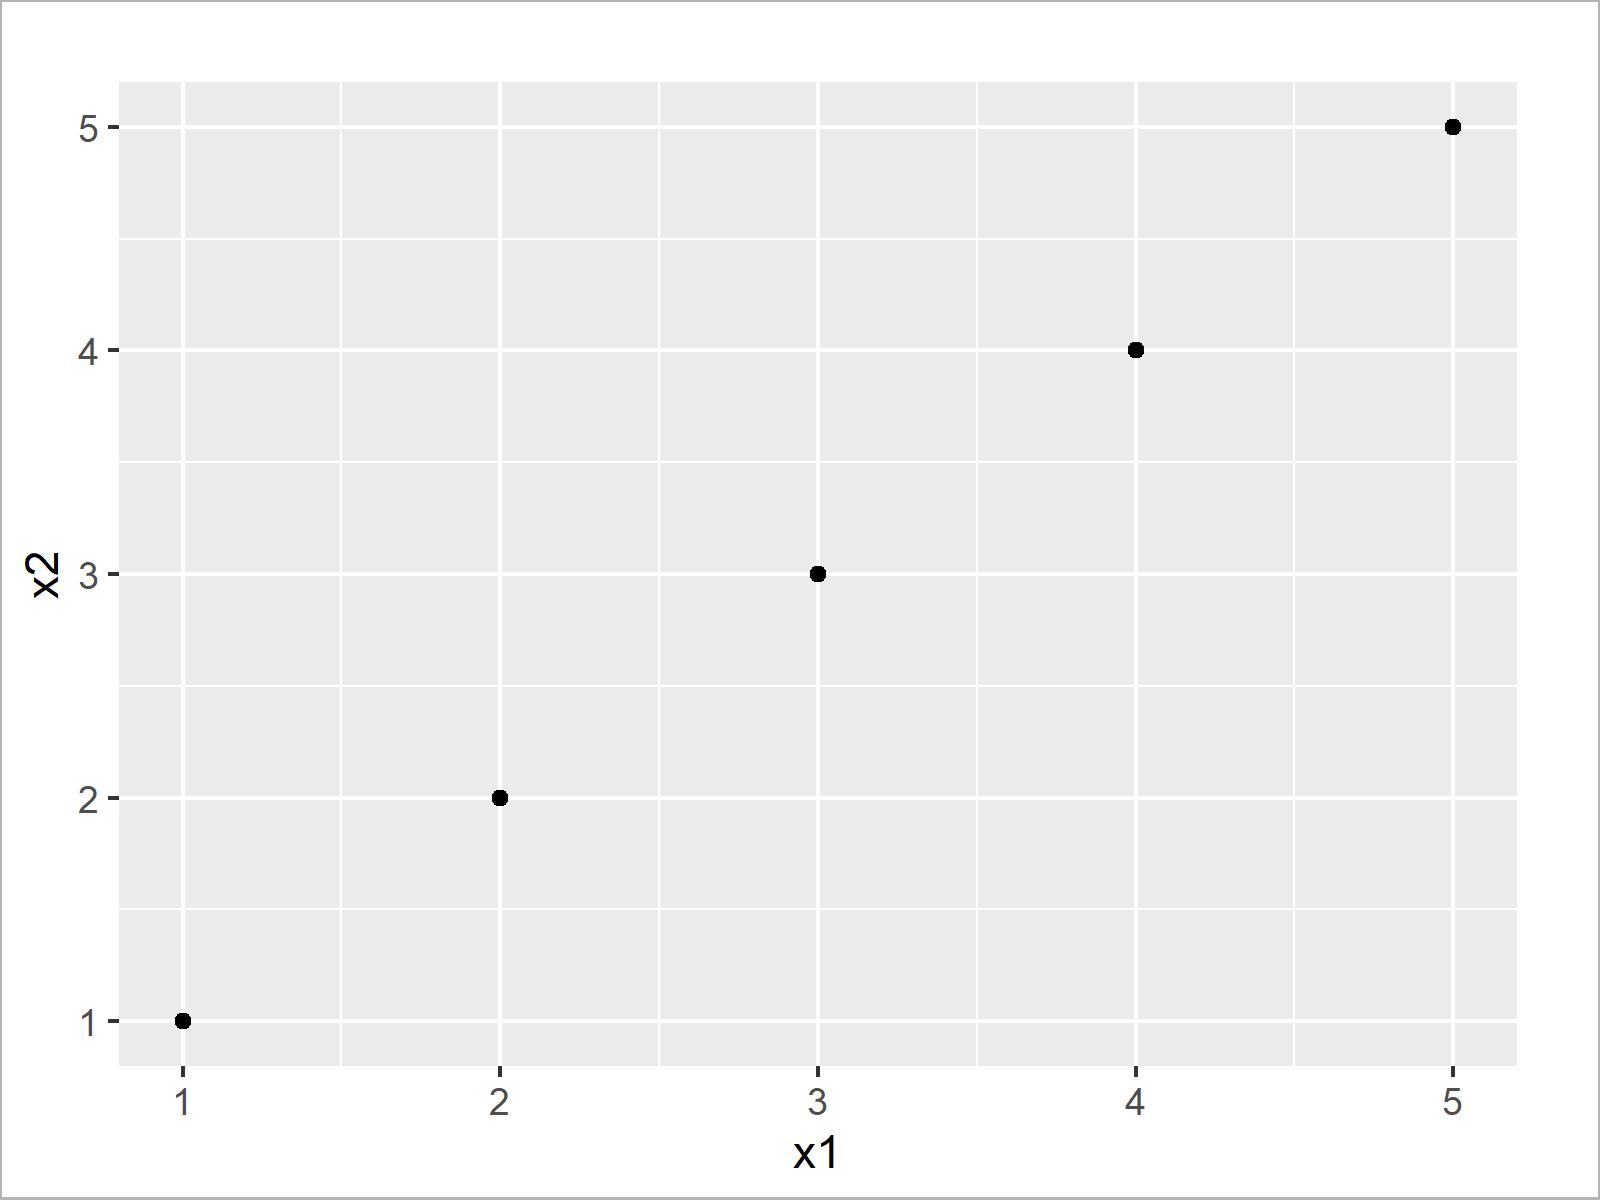 r graph figure 1 ggplot2 error cannot use gg single argument r